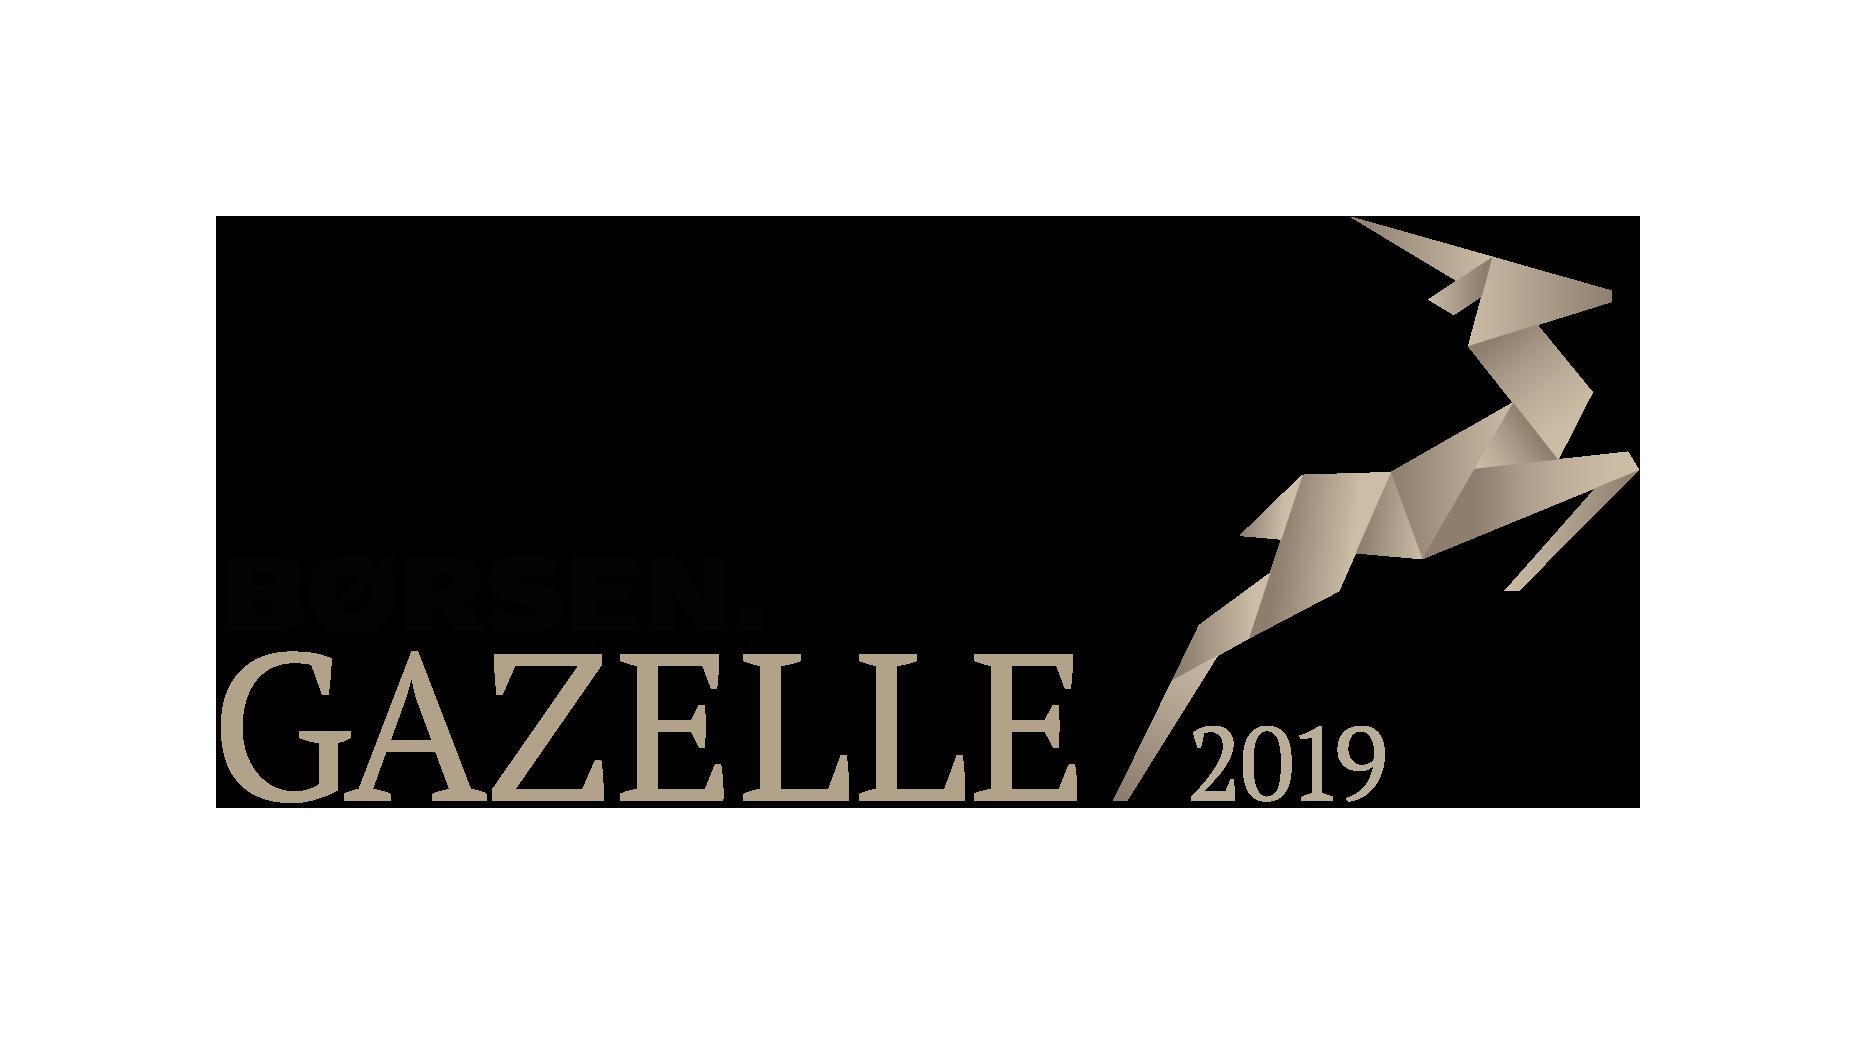 gazelle2019-logo_RGB_positiv